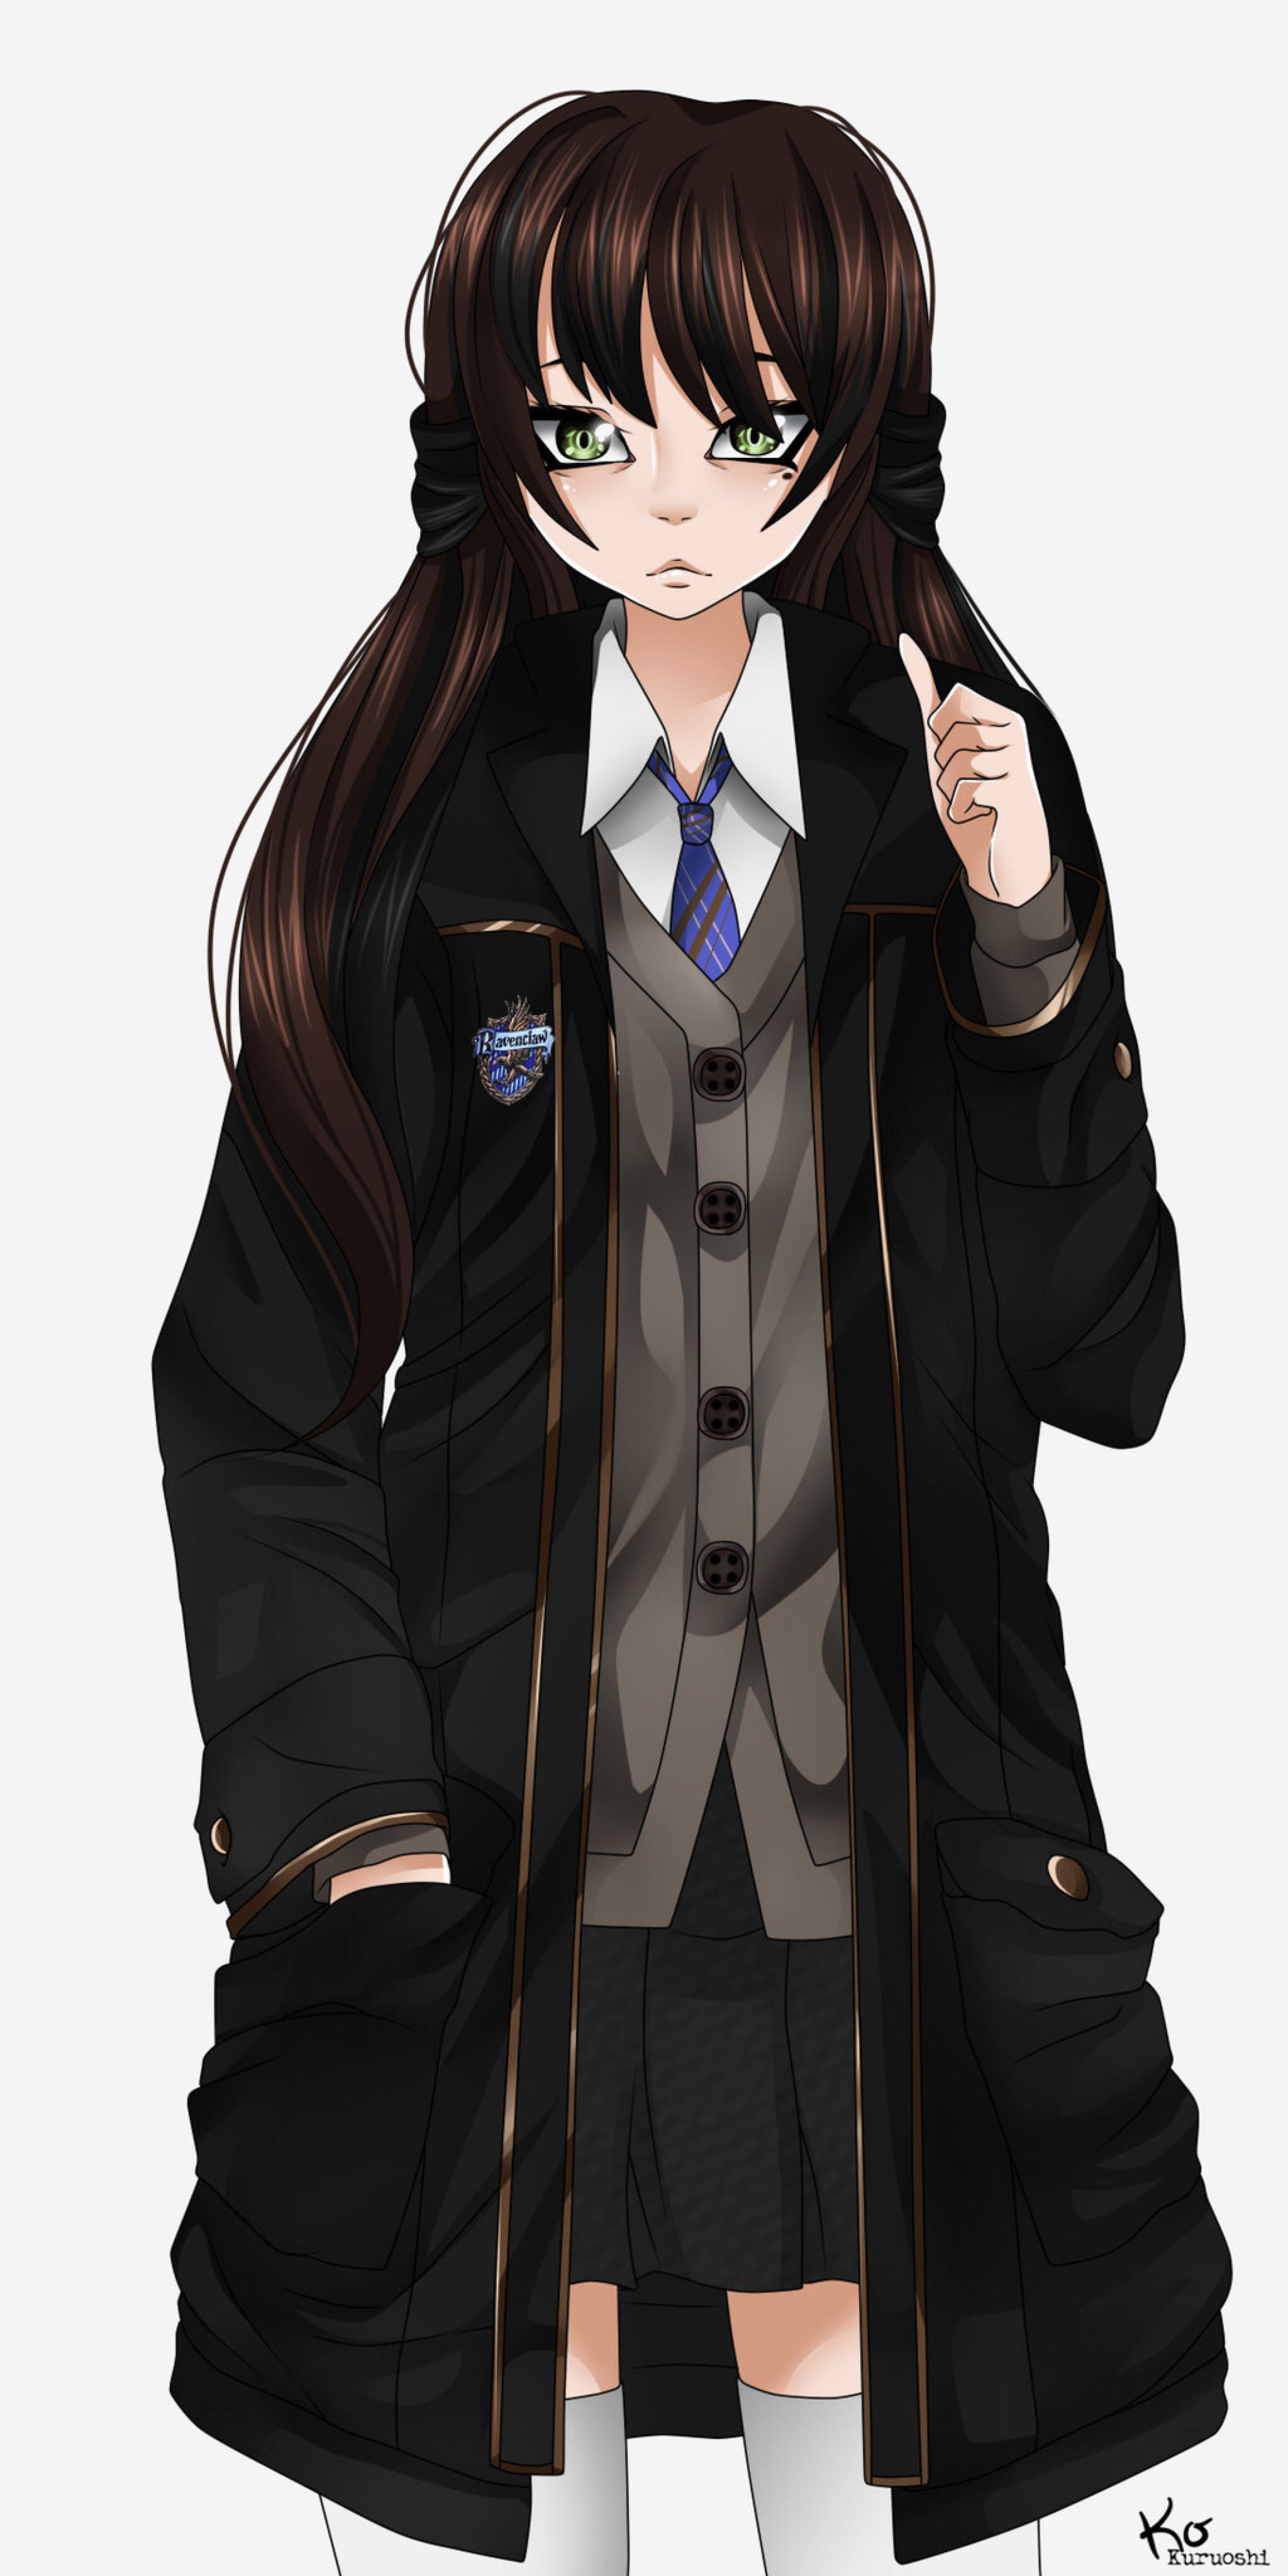 Harry Potter Oc Joyce Owlroosper By Tamashi Miko On Deviantart